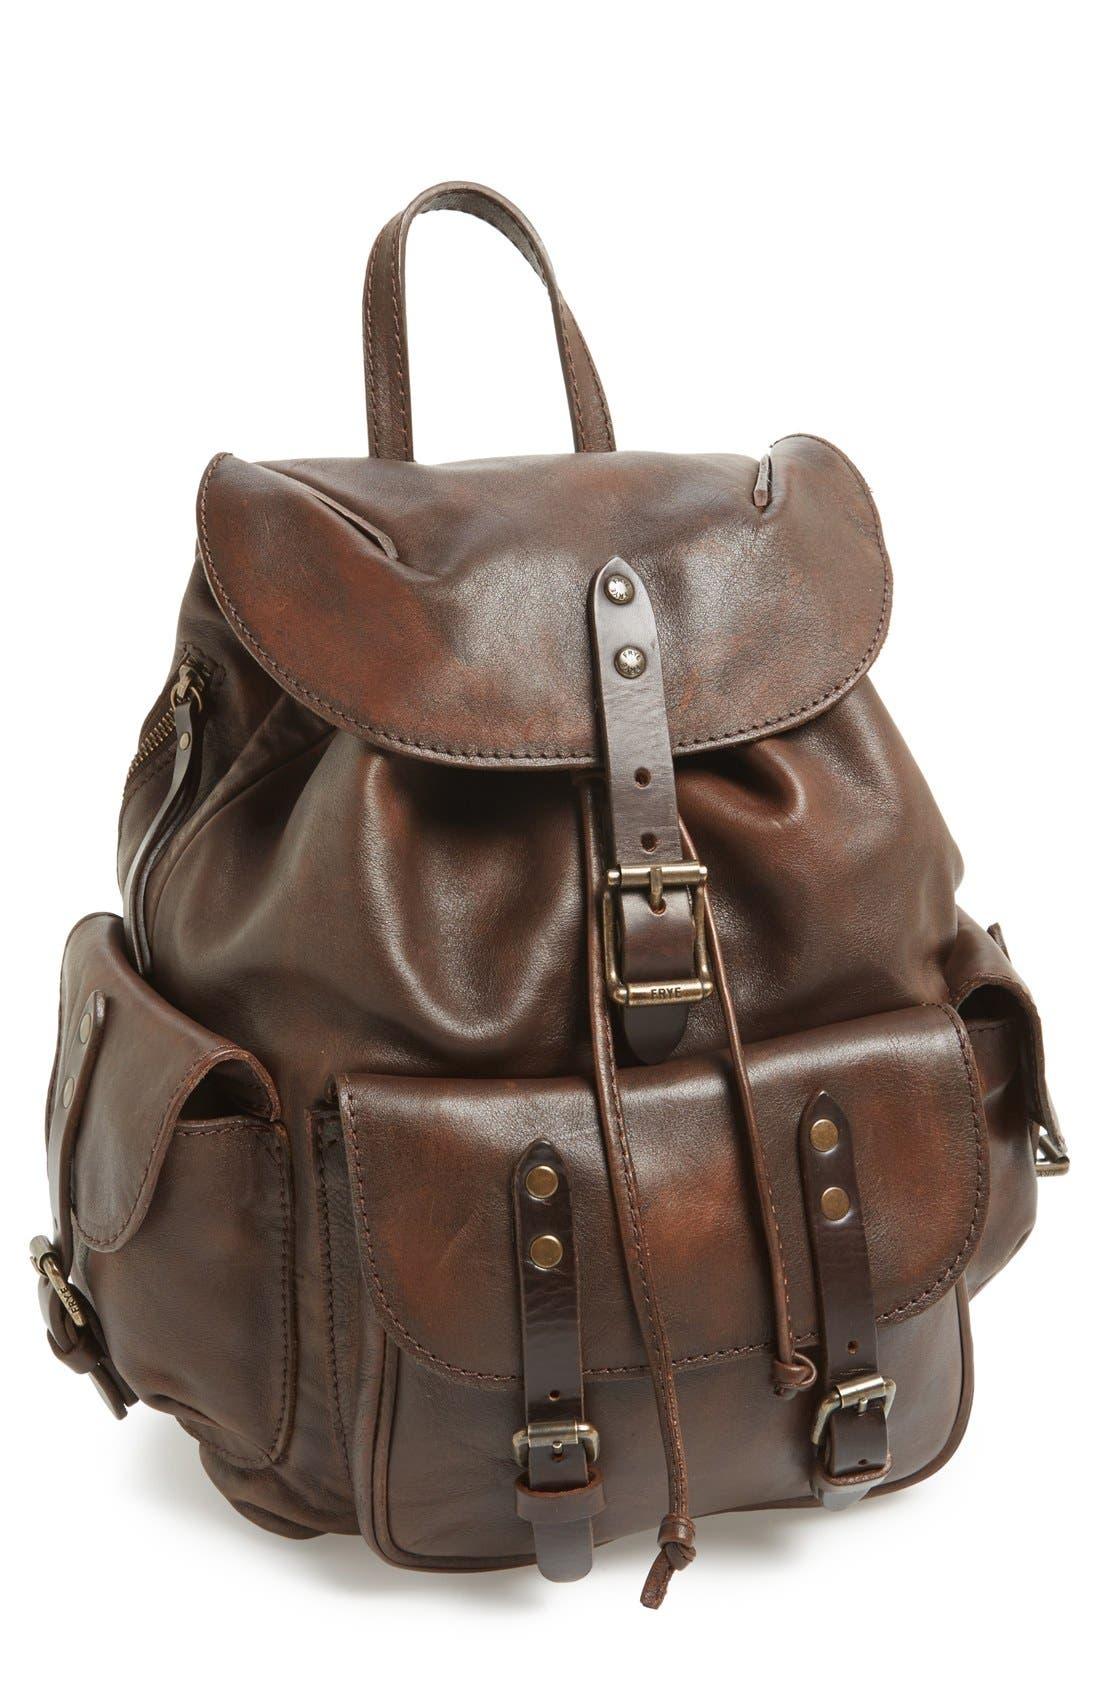 Alternate Image 1 Selected - Frye 'Veronica' Leather Backpack